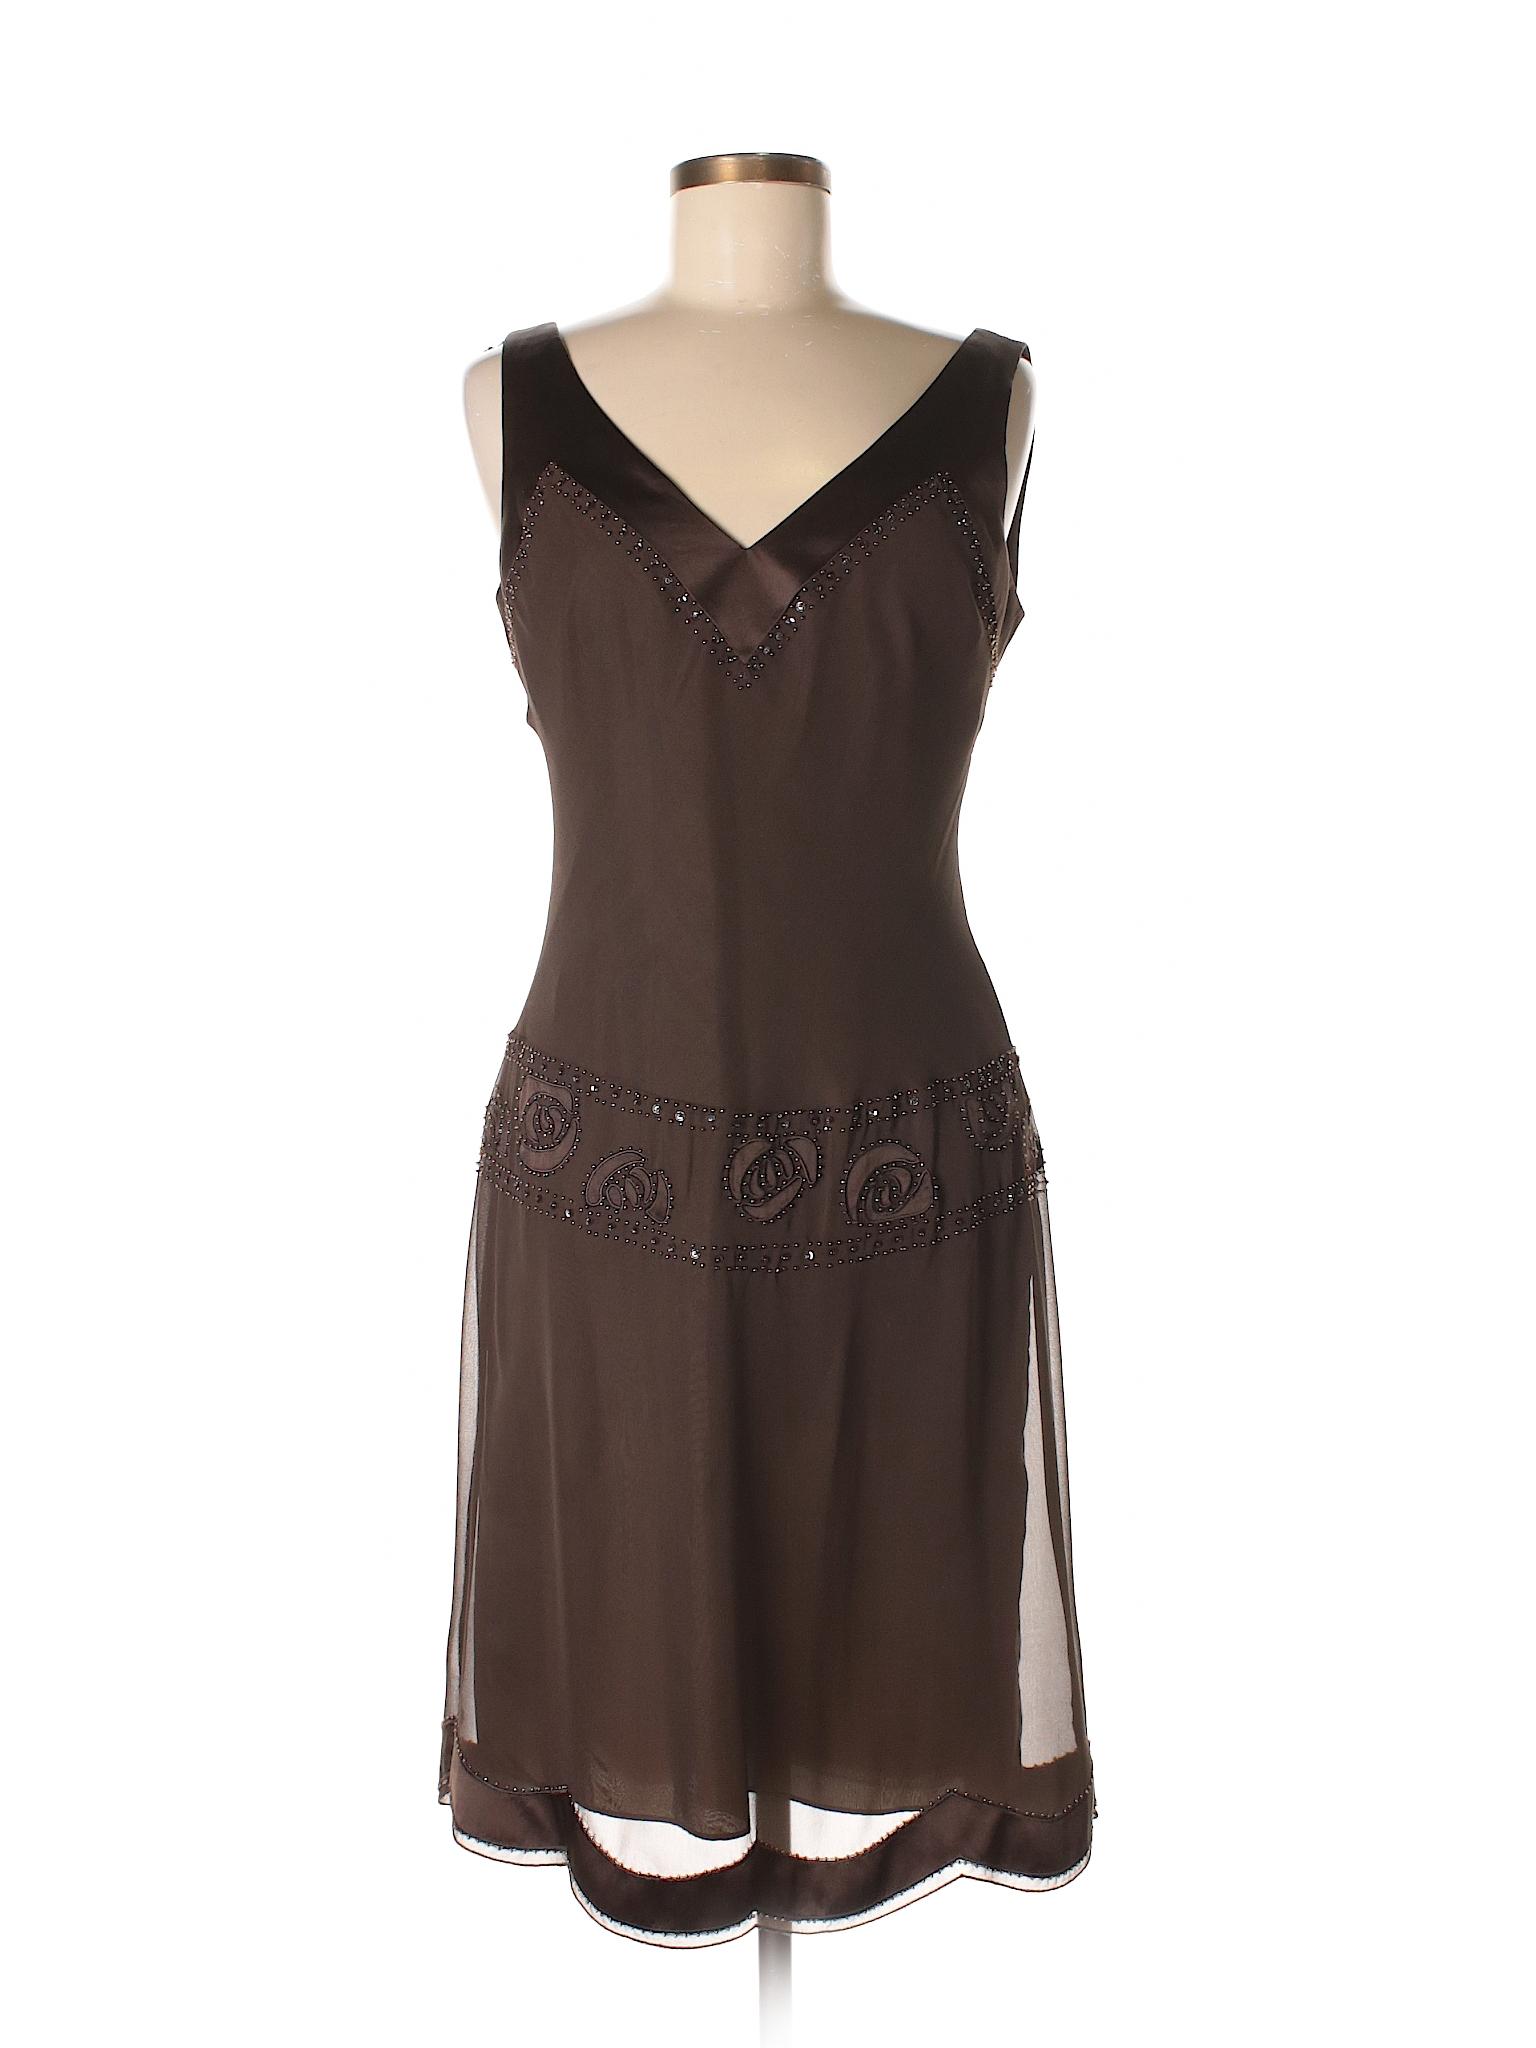 Selling West Casual Nine West West Nine Selling Dress Casual Casual Dress Nine Selling rr06qw4n